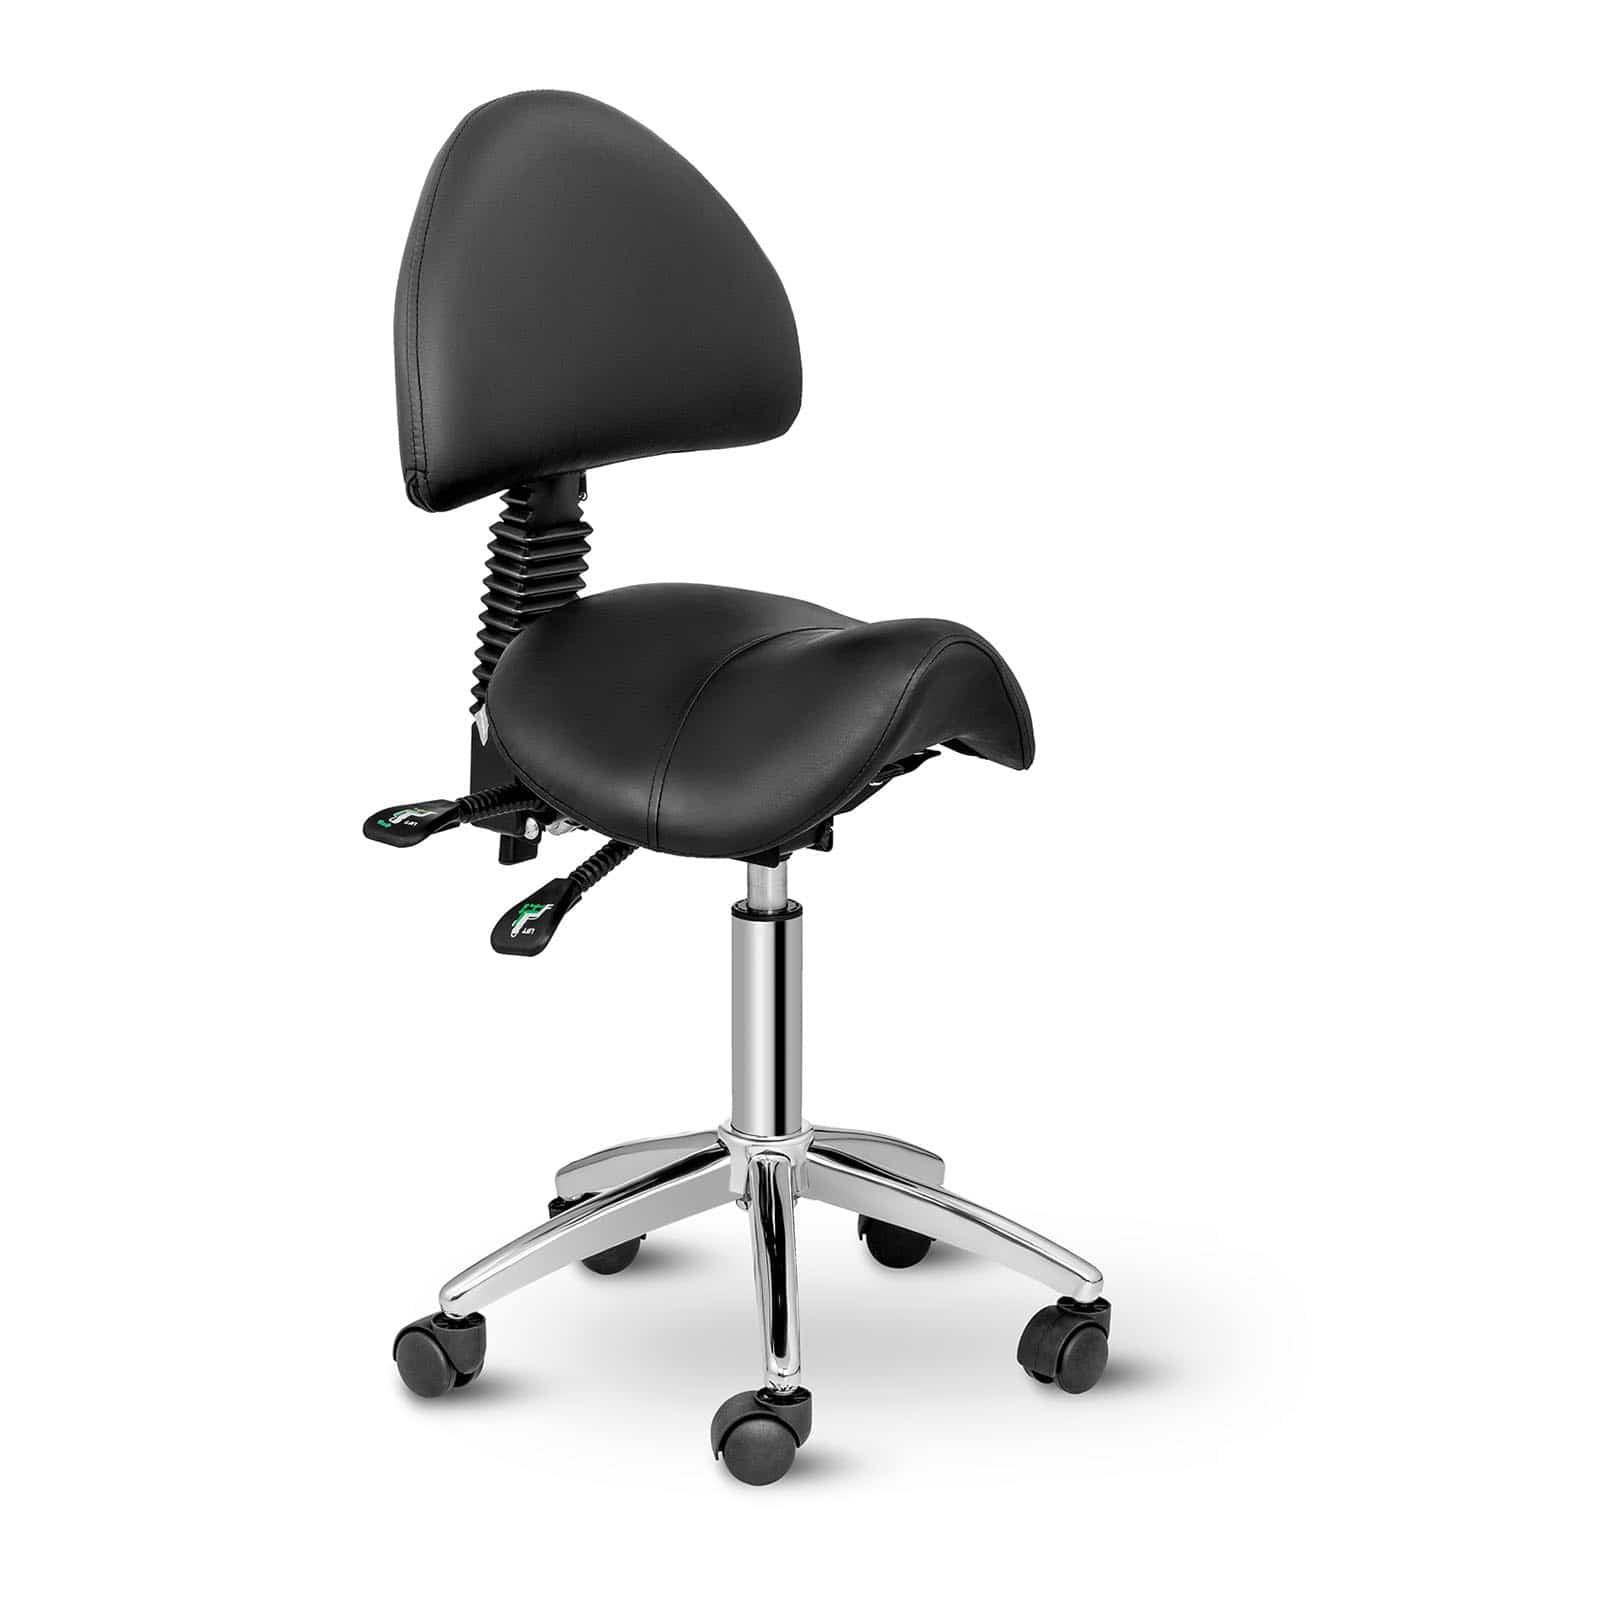 Sedlové židle